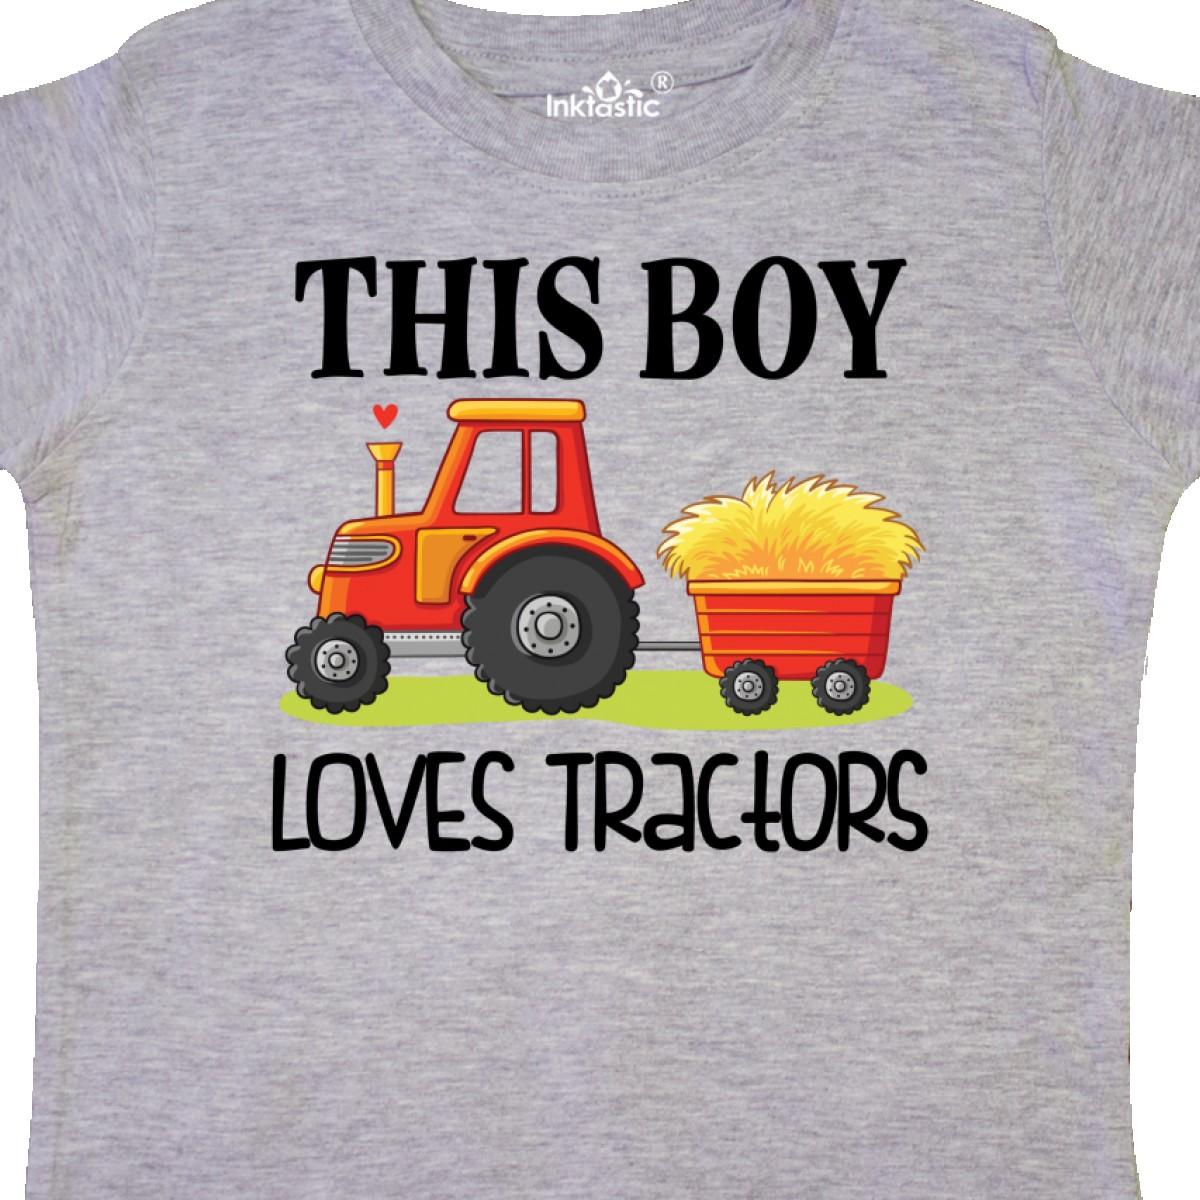 Inktastic-Farming-Cute-Boy-Loves-Tractors-Toddler-T-Shirt-Farm-Childs-Toys-Kids thumbnail 8